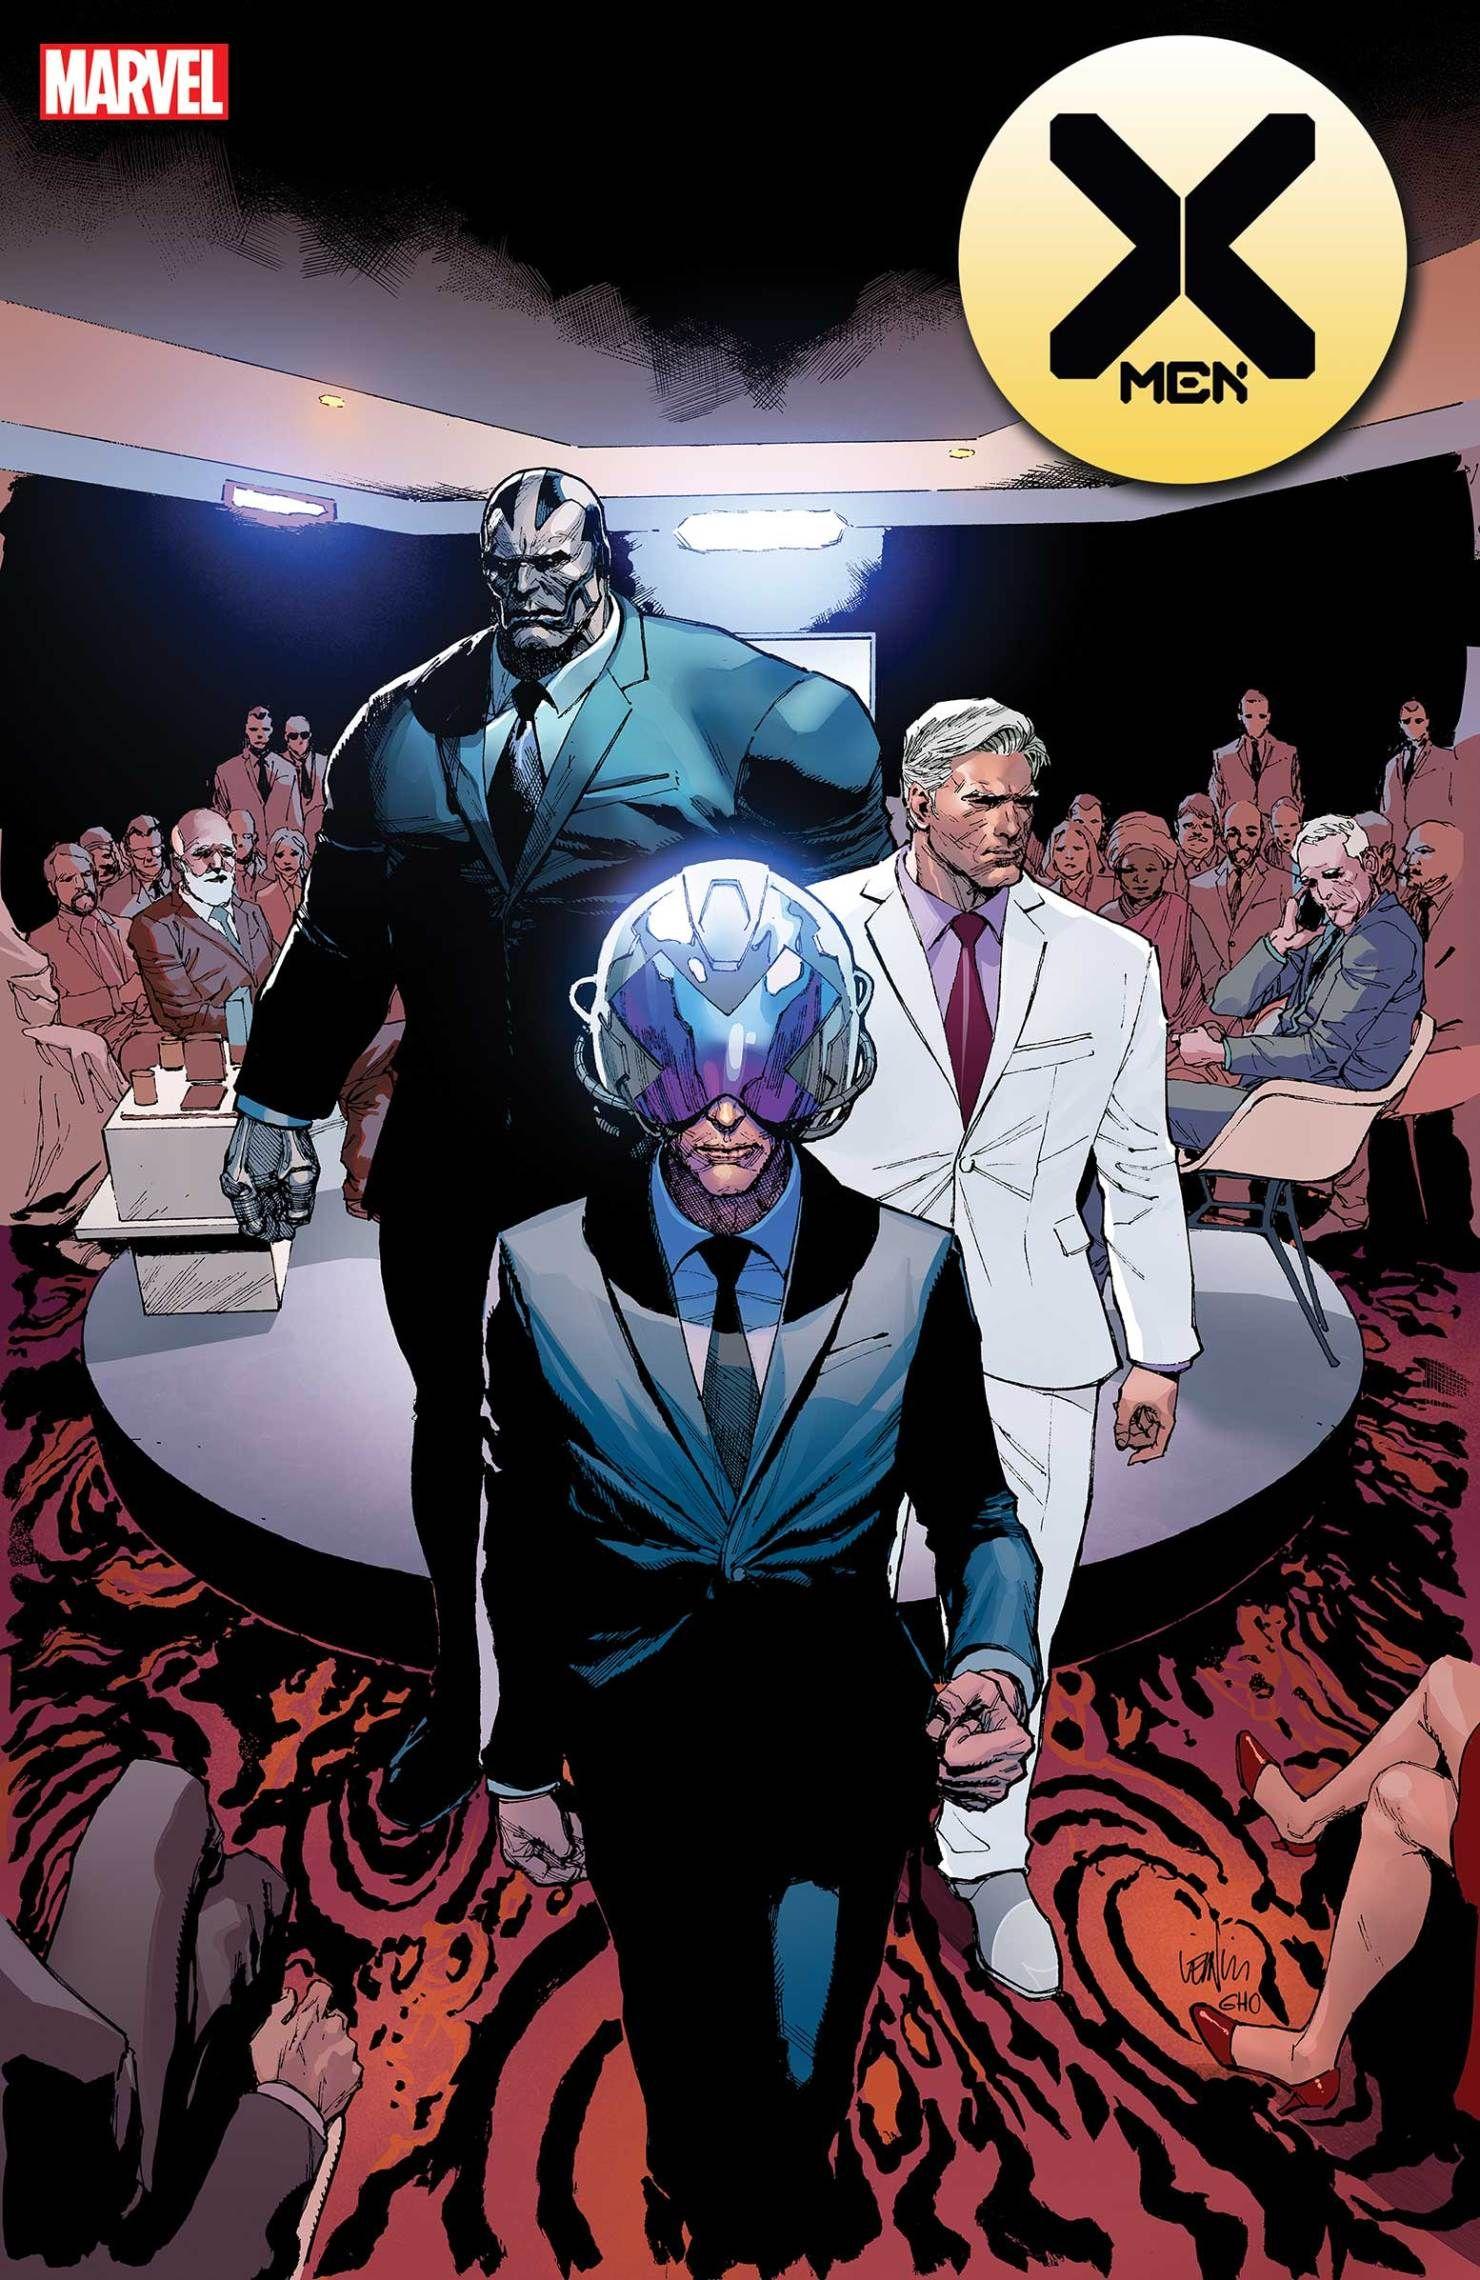 X Men 4 Written By Jonathan Hickman Art By Leinil Francis Yu Cover By Leinil Francis Yu Mutants Are The Future Marvel Comics Art Marvel Comics Comics Artwork